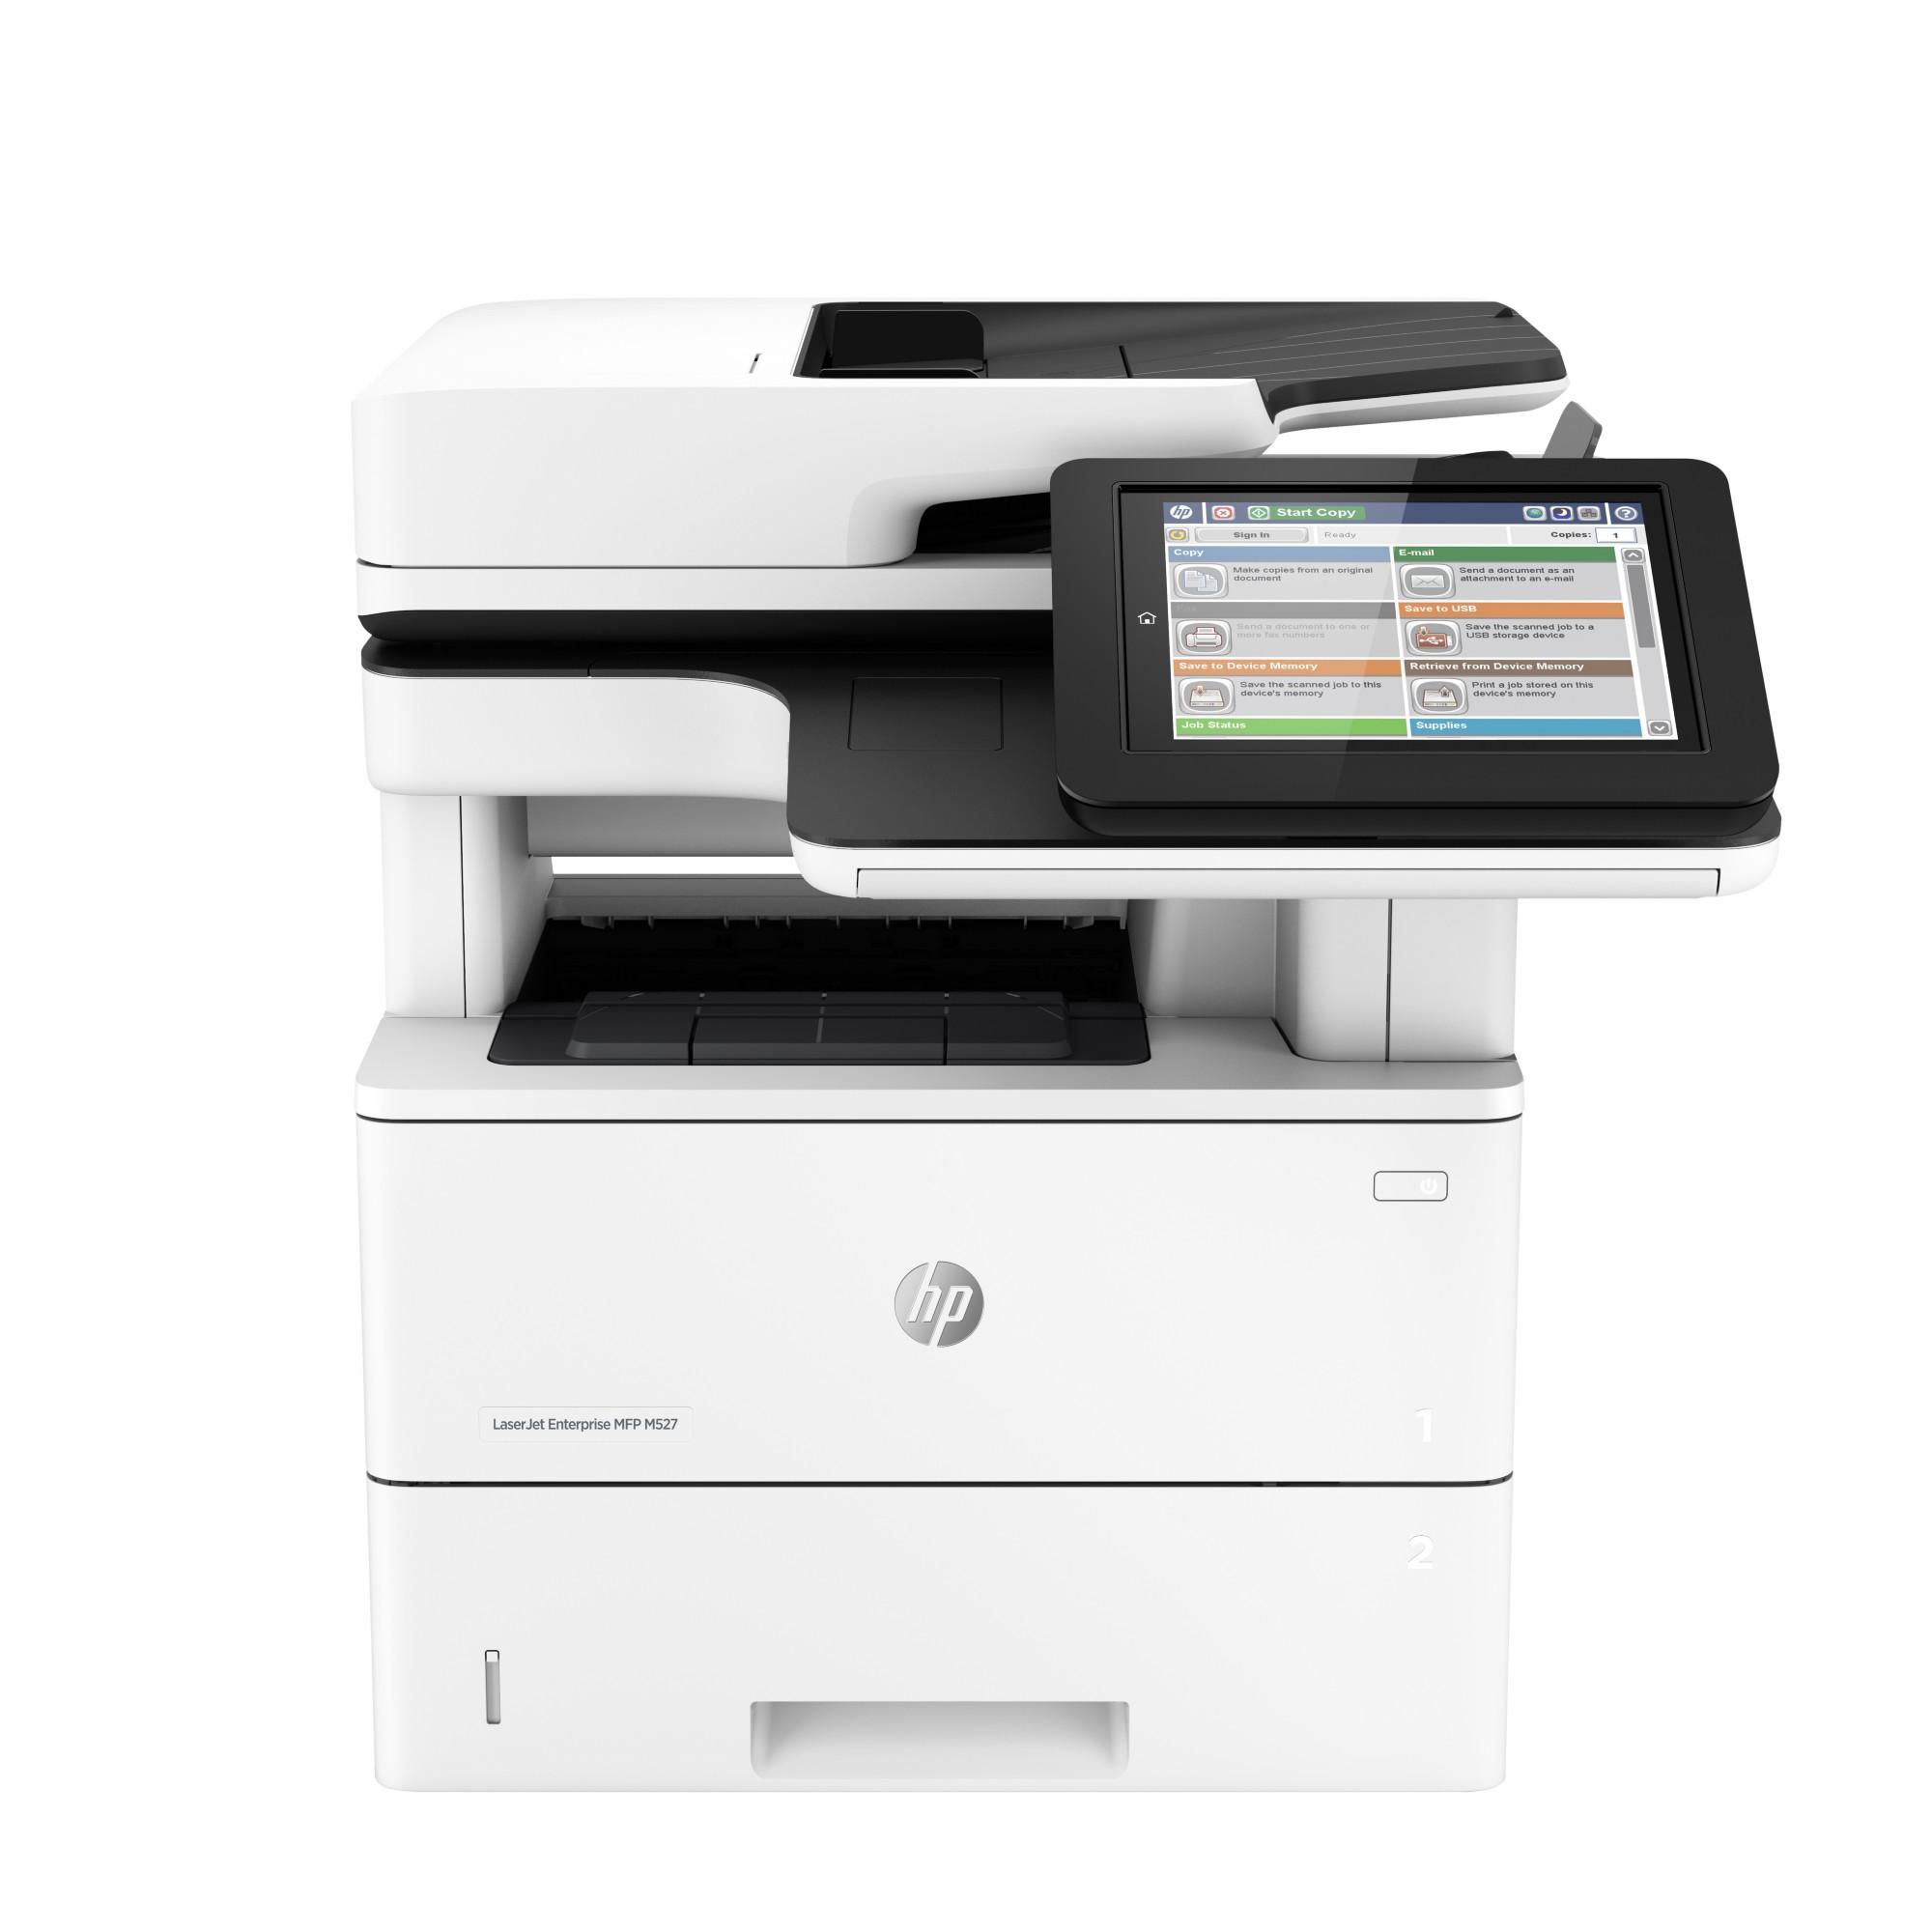 HP LaserJet Enterprise MFP M527dn 1200 x 1200DPI Laser A4 43ppm